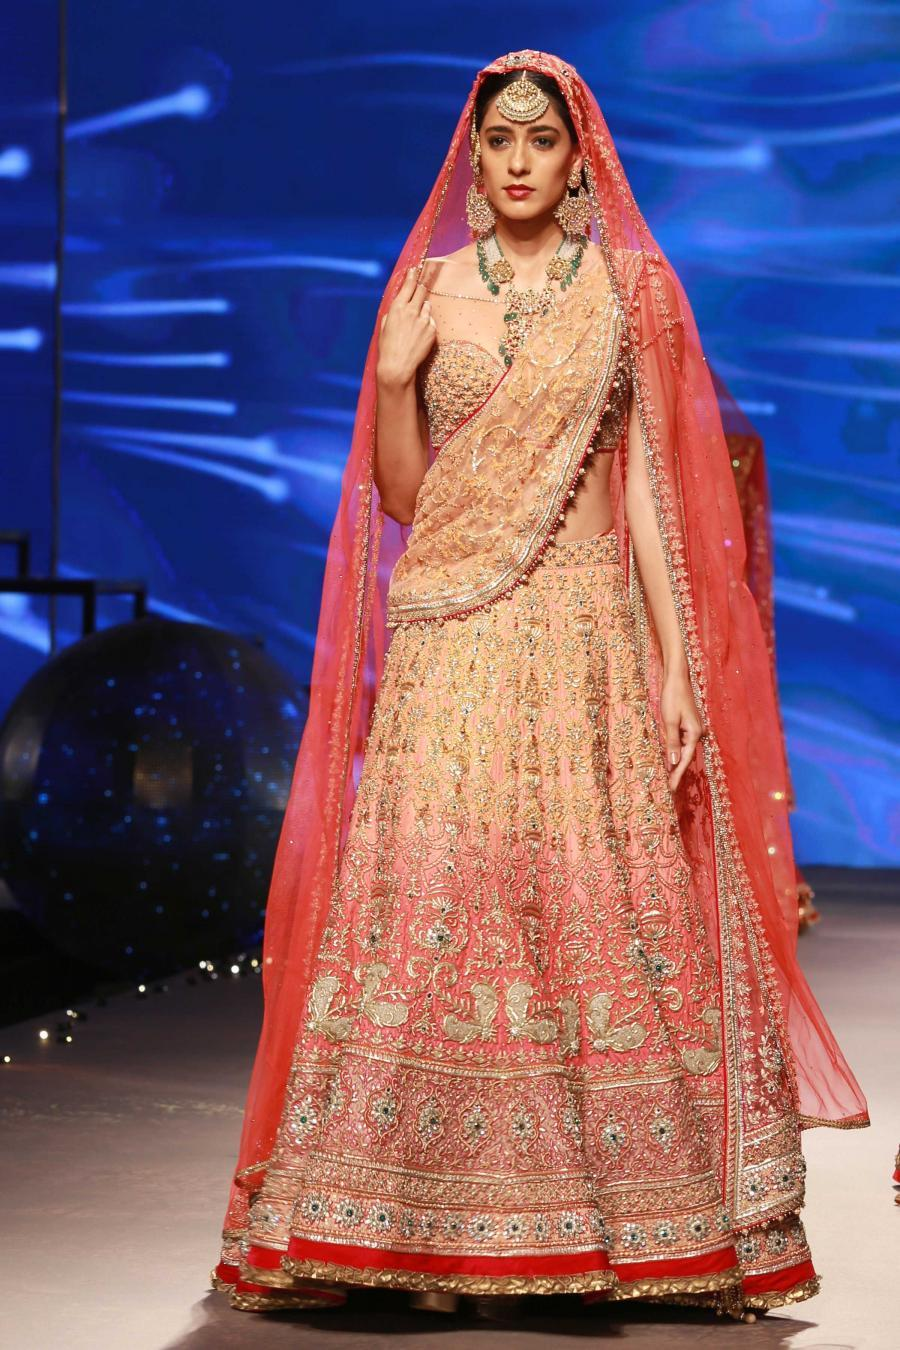 Lisa Haydon Walk at BMW India Bridal Fashion Week 2015-21